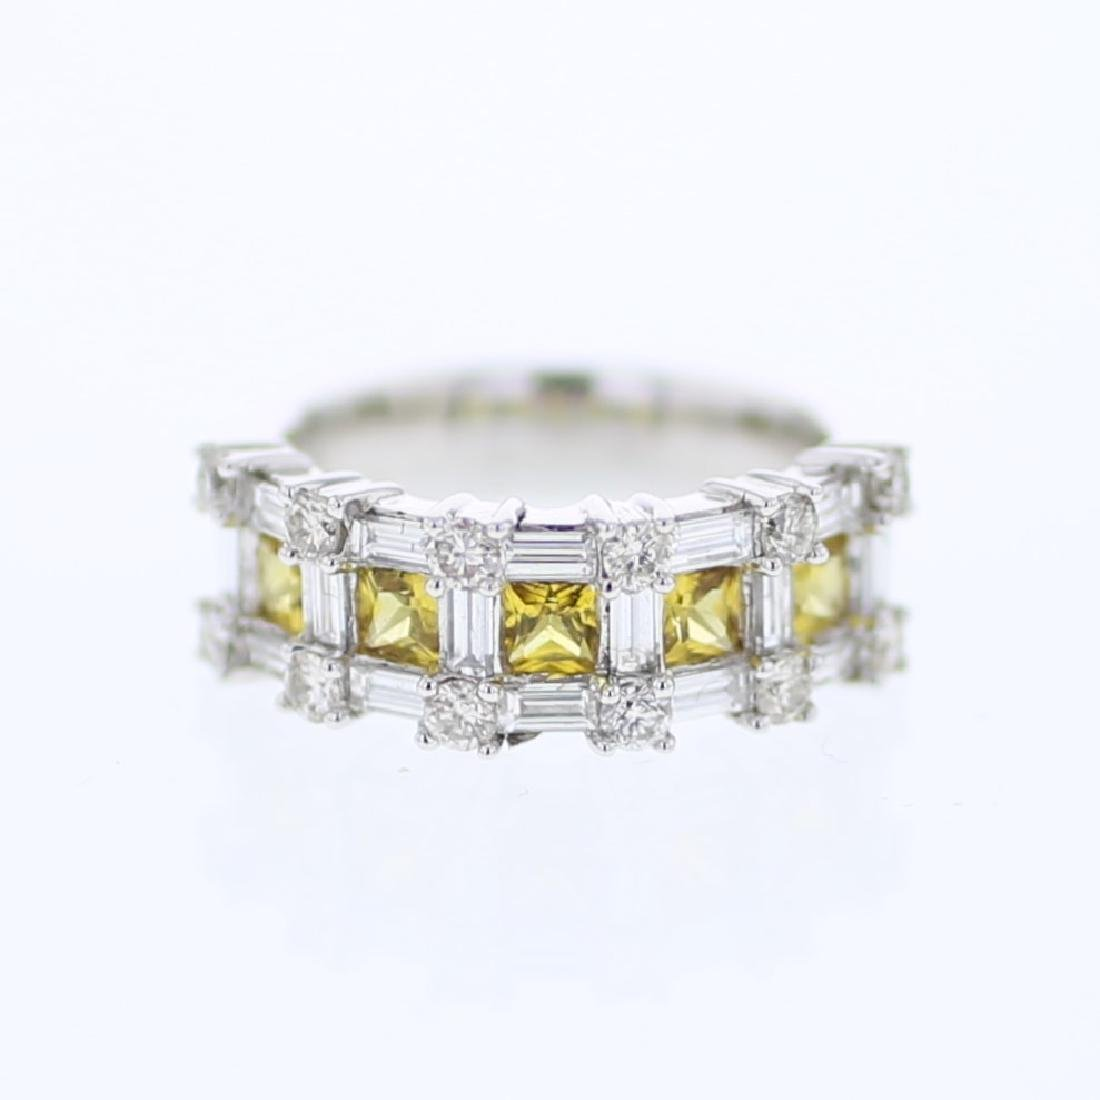 14KT White Gold 1.06ctw Yellow Sapphire and Diamond